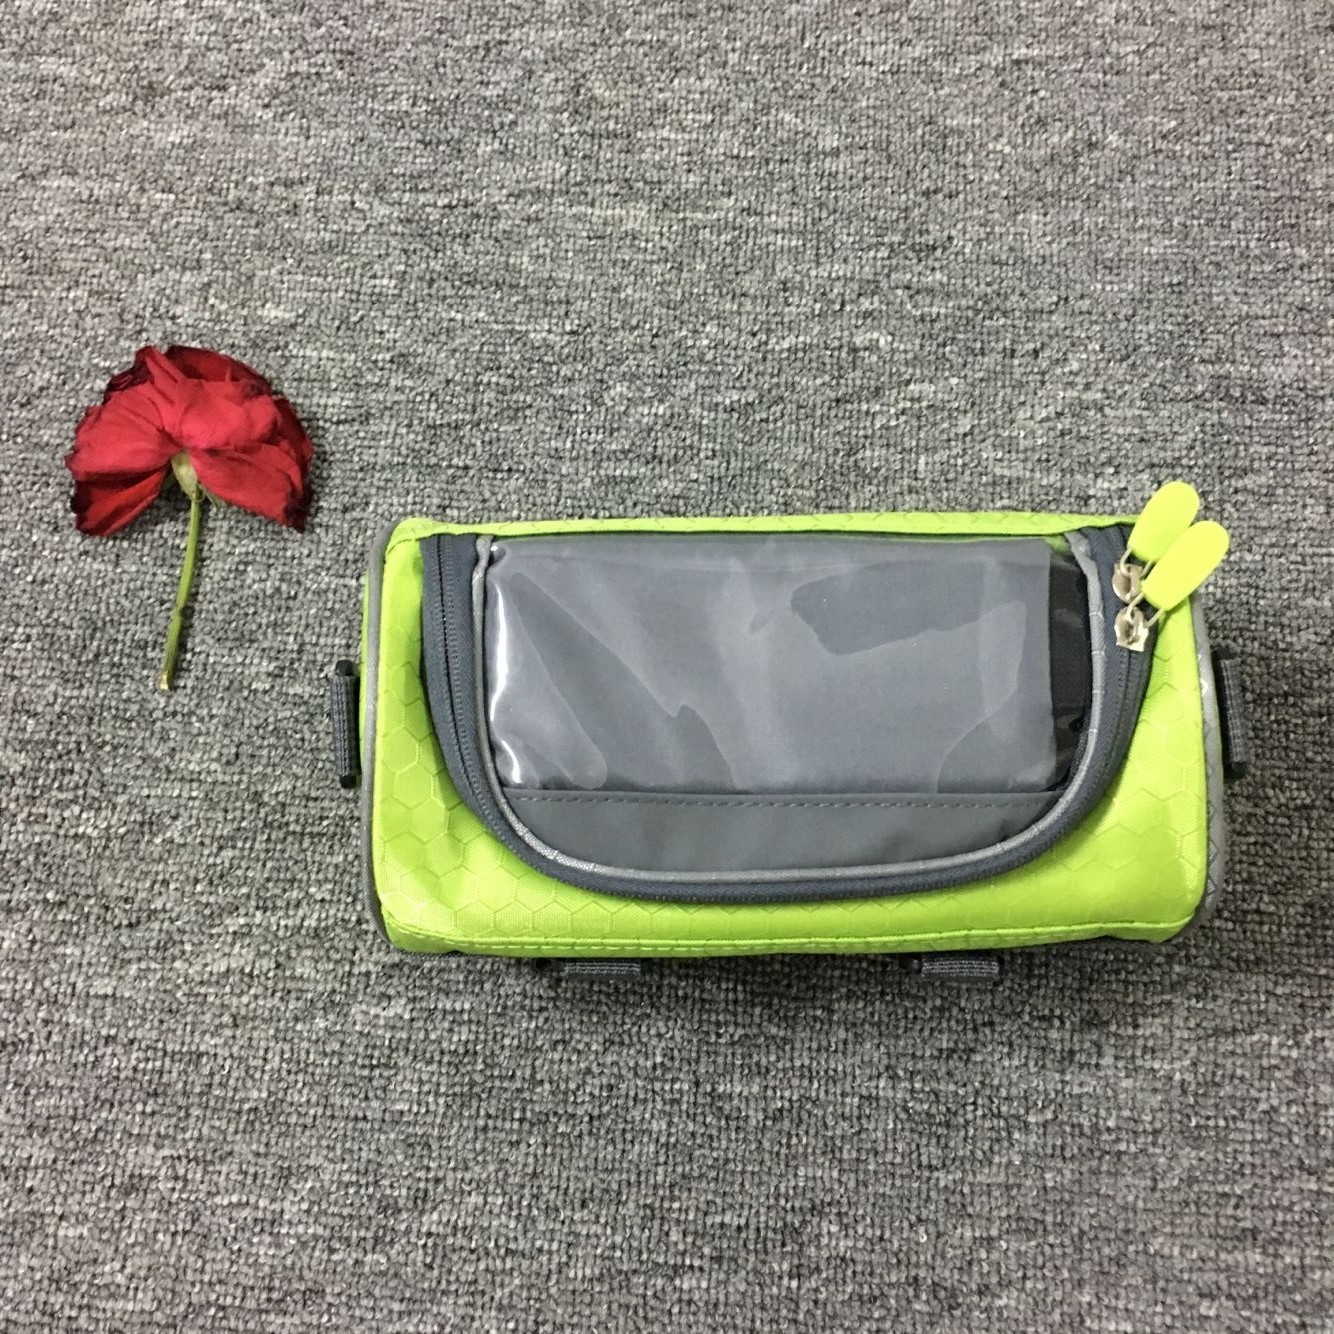 Bicycle Bag Multifunctional Touch Screen Frame Tube Handlebar Bag Riding Storage Bag green_22*12*12